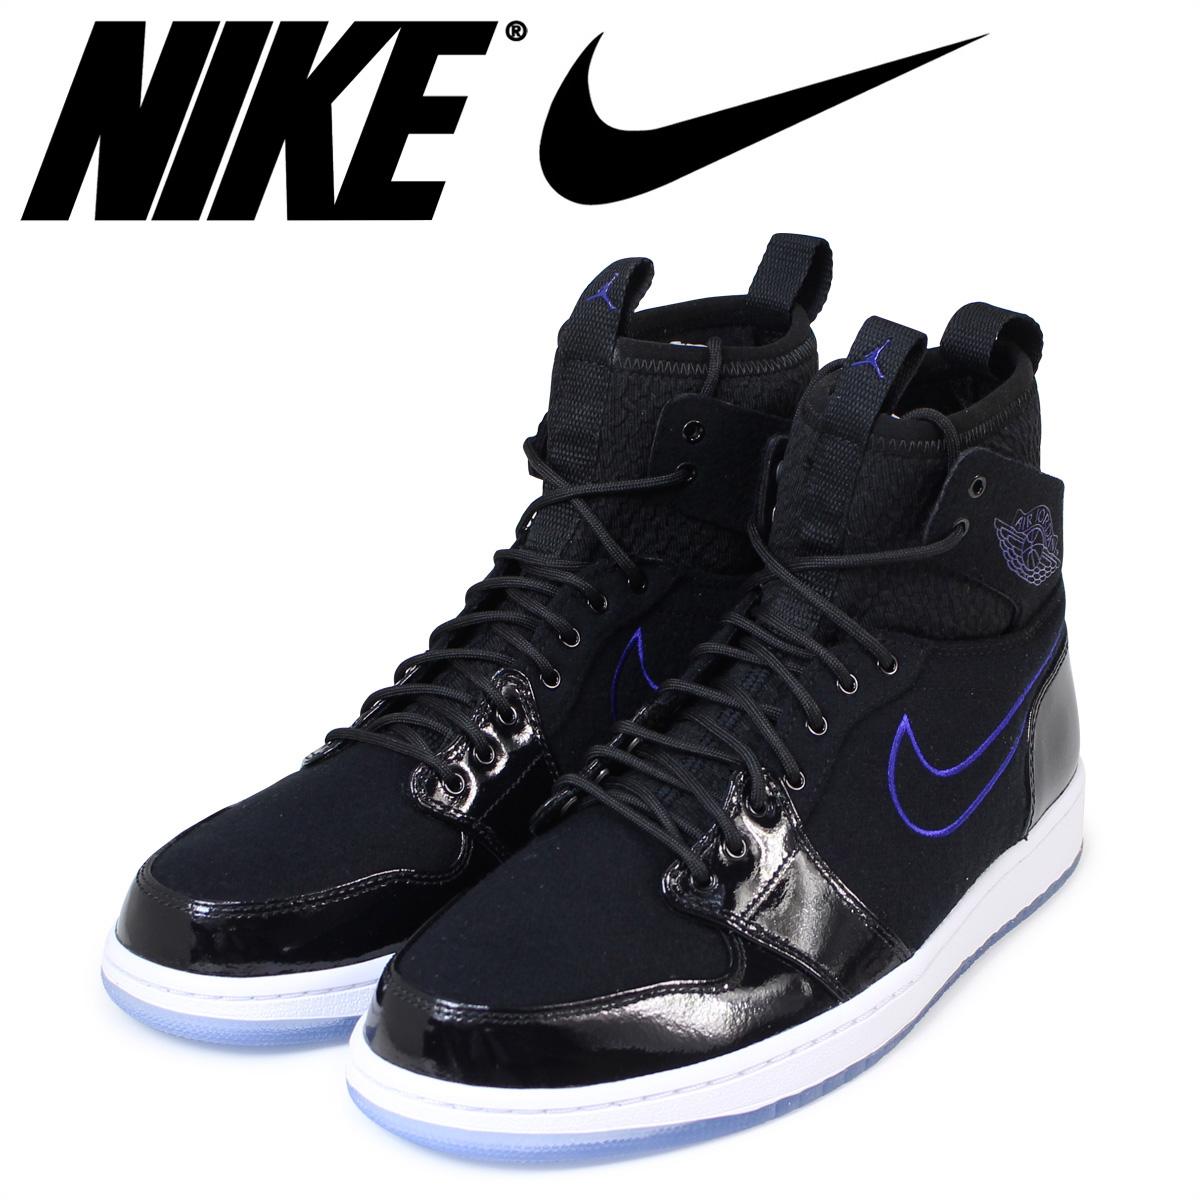 finest selection 4fb71 65d63 NIKE AIR JORDAN 1 HIGH ULTRA SPACE JAM Nike Air Jordan 1 sneakers men high  ultra space black 844,700-002